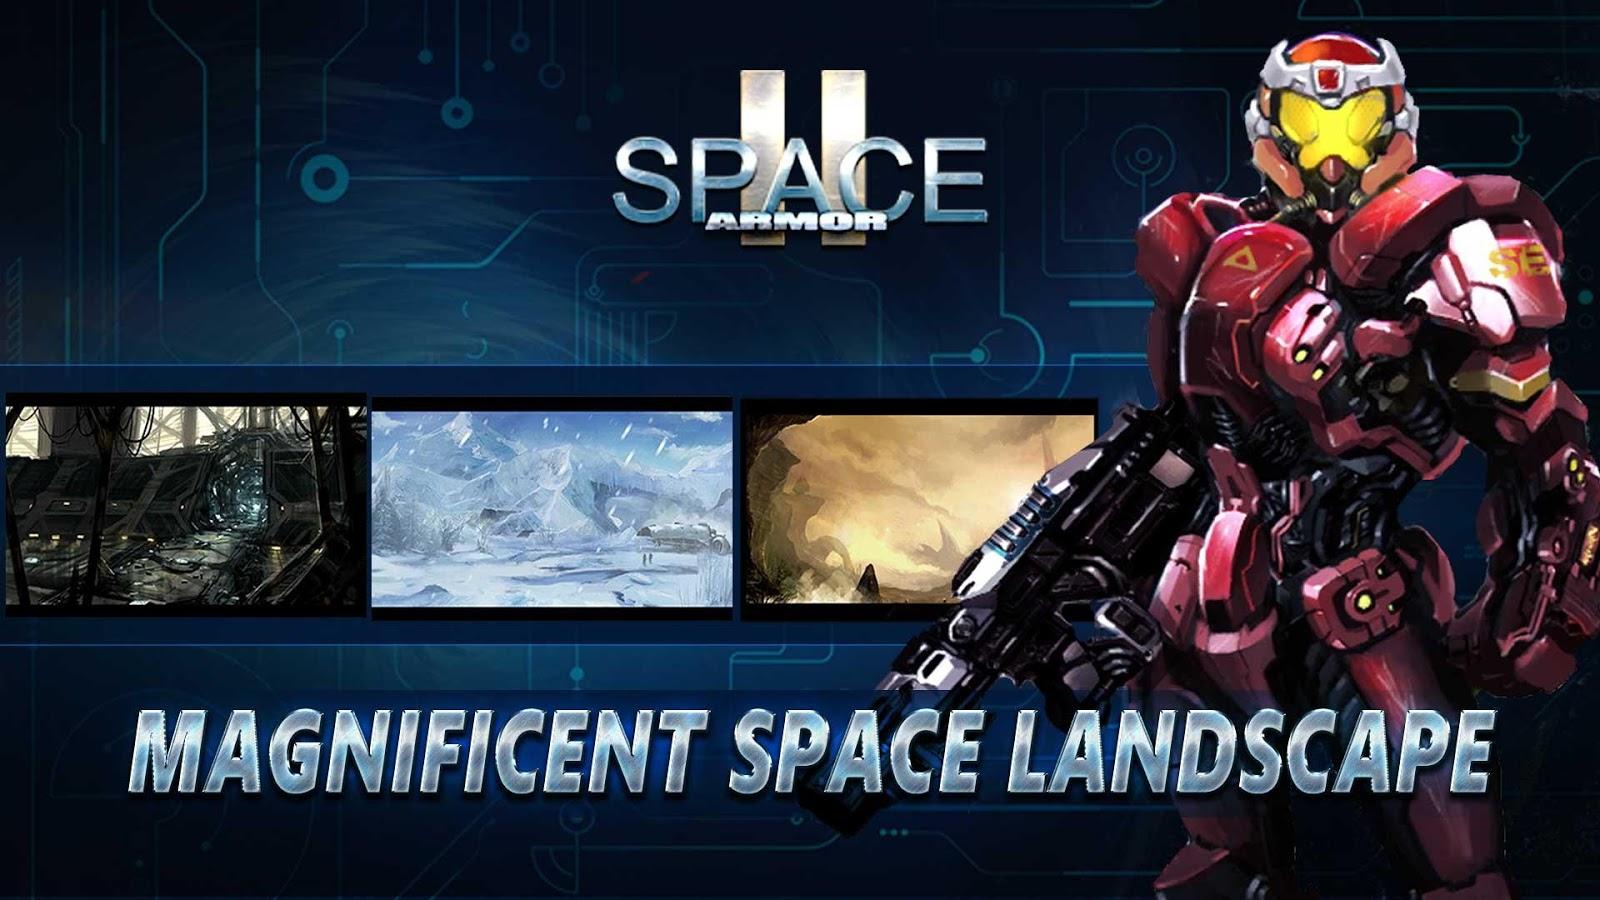 Download Space Armor 2 MOD APK terbaru